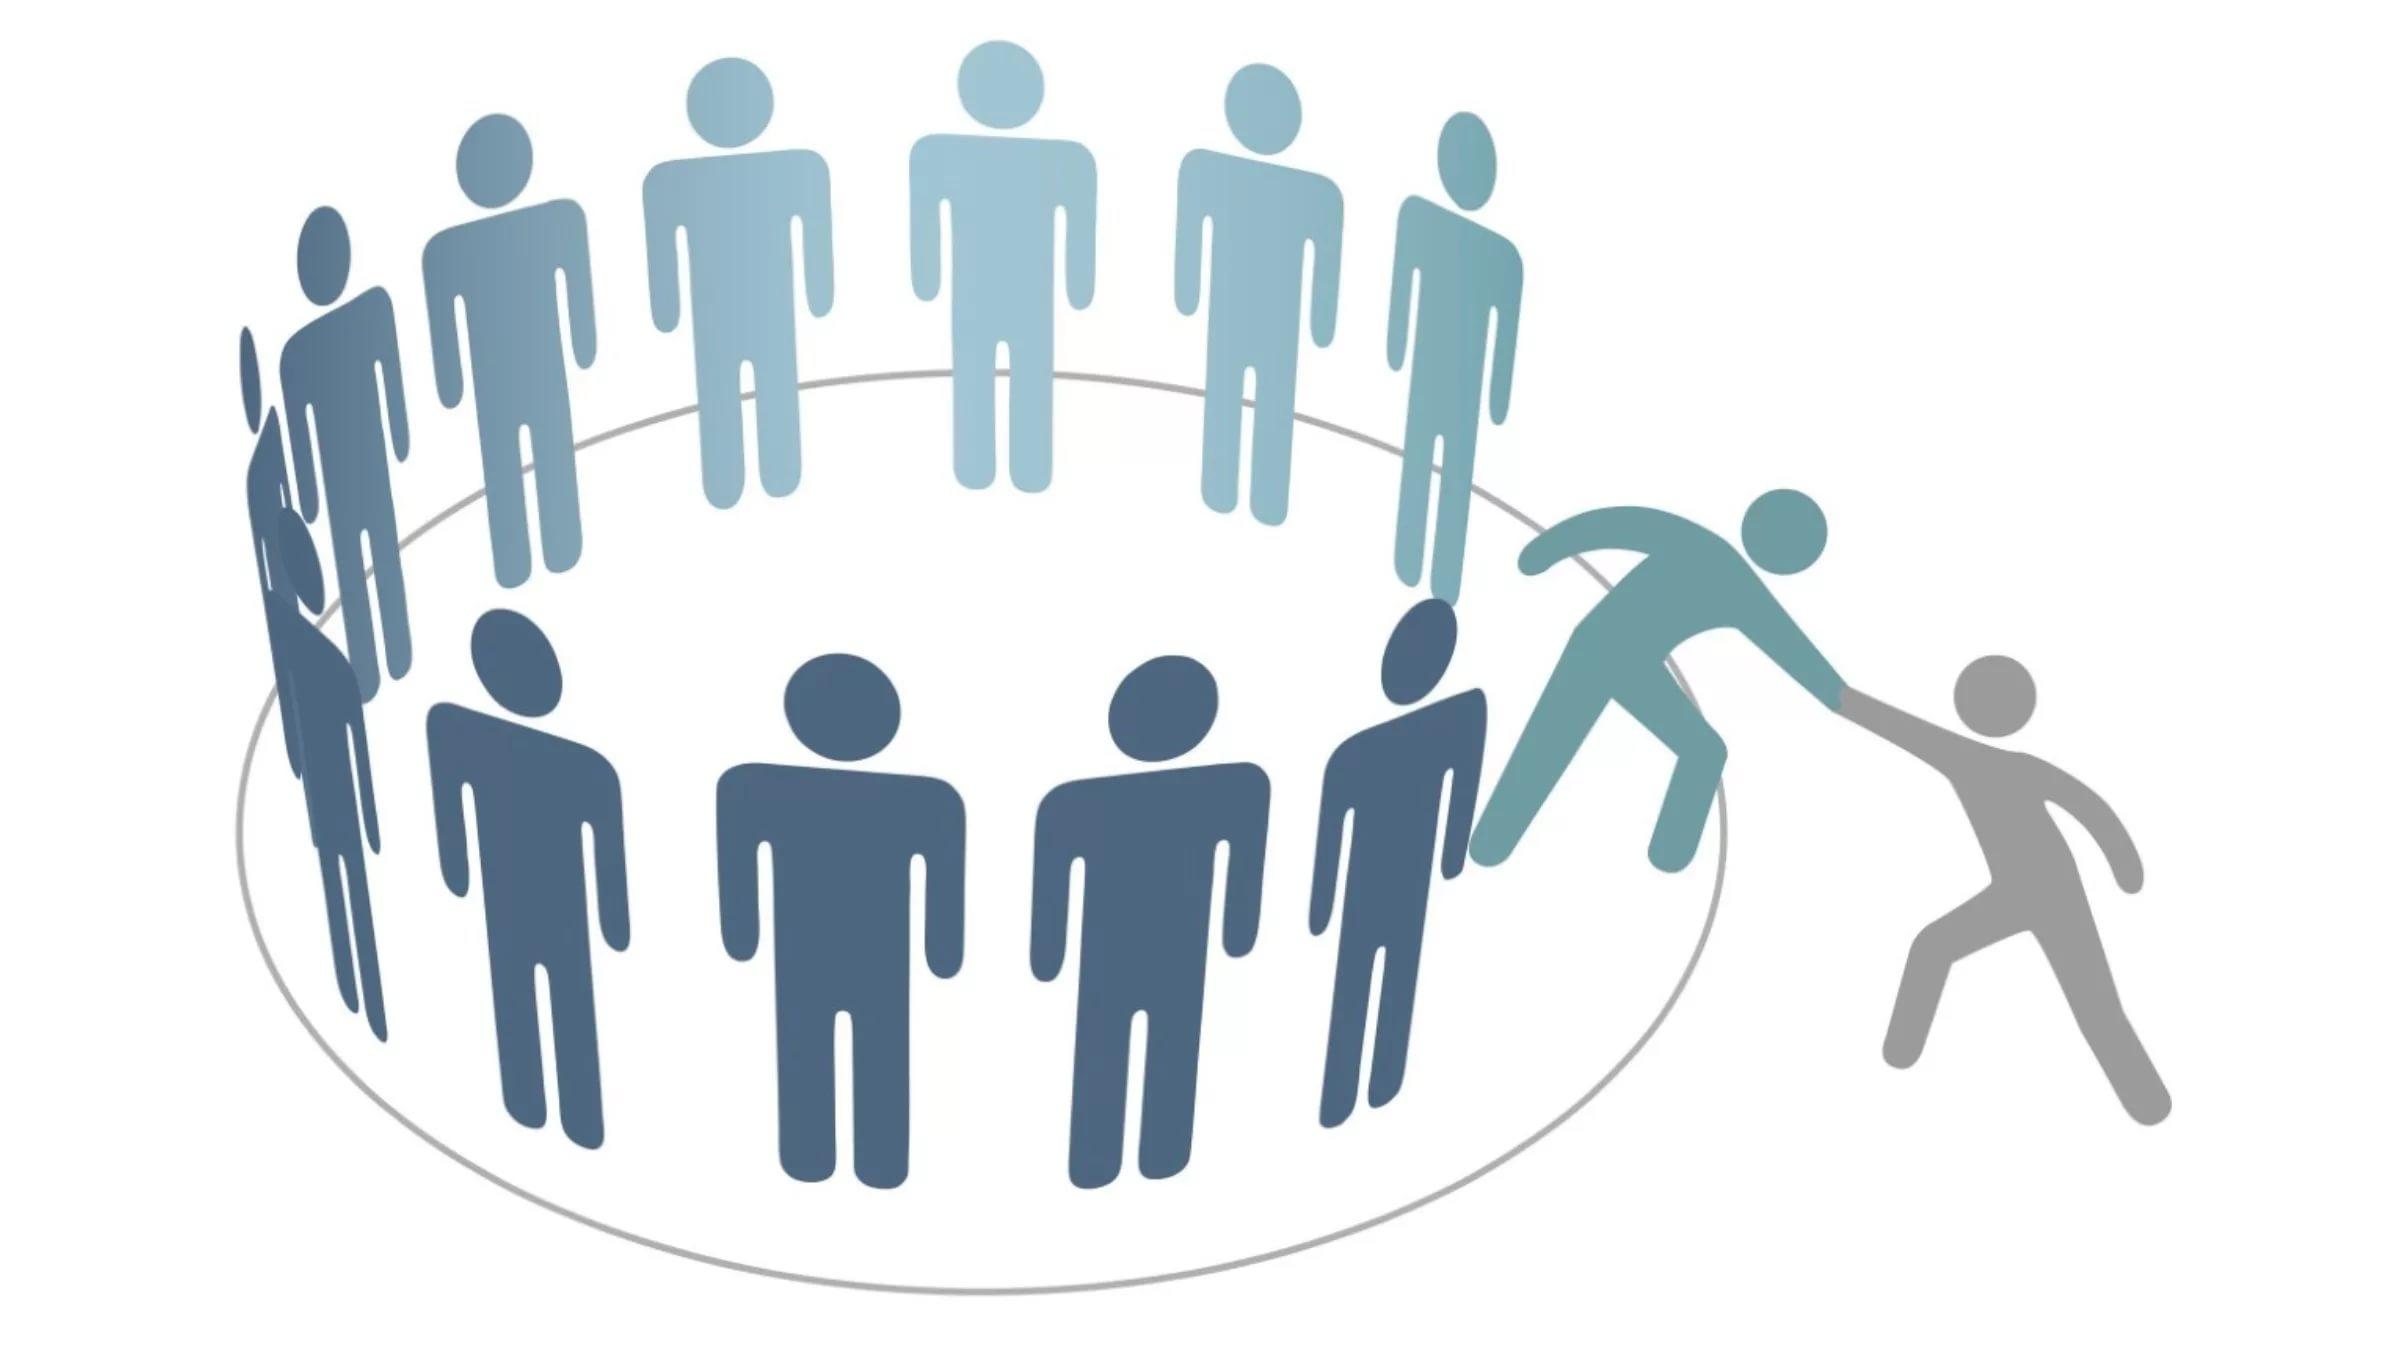 казанцев сайт бизнес психолог